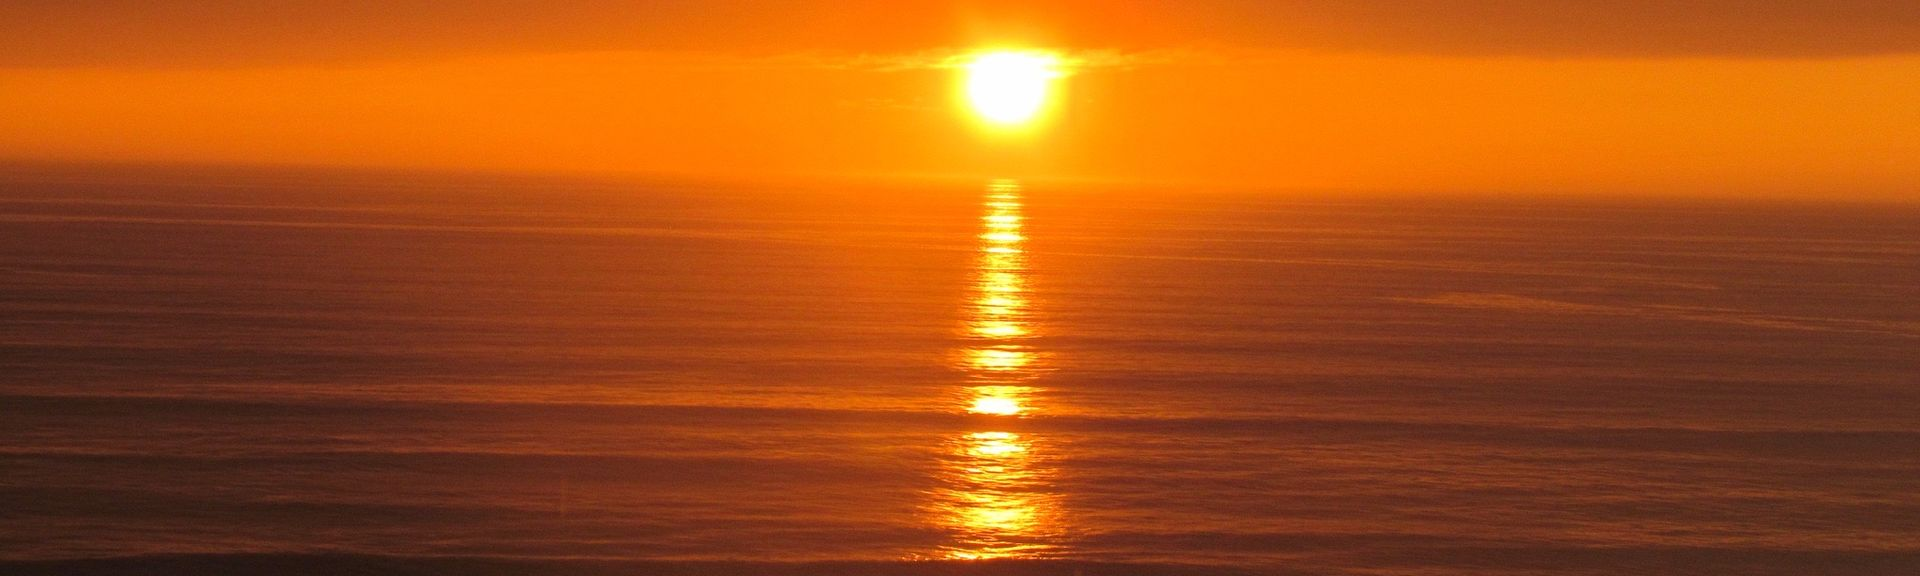 Olde Solana Beach, Solana Beach, California, United States of America